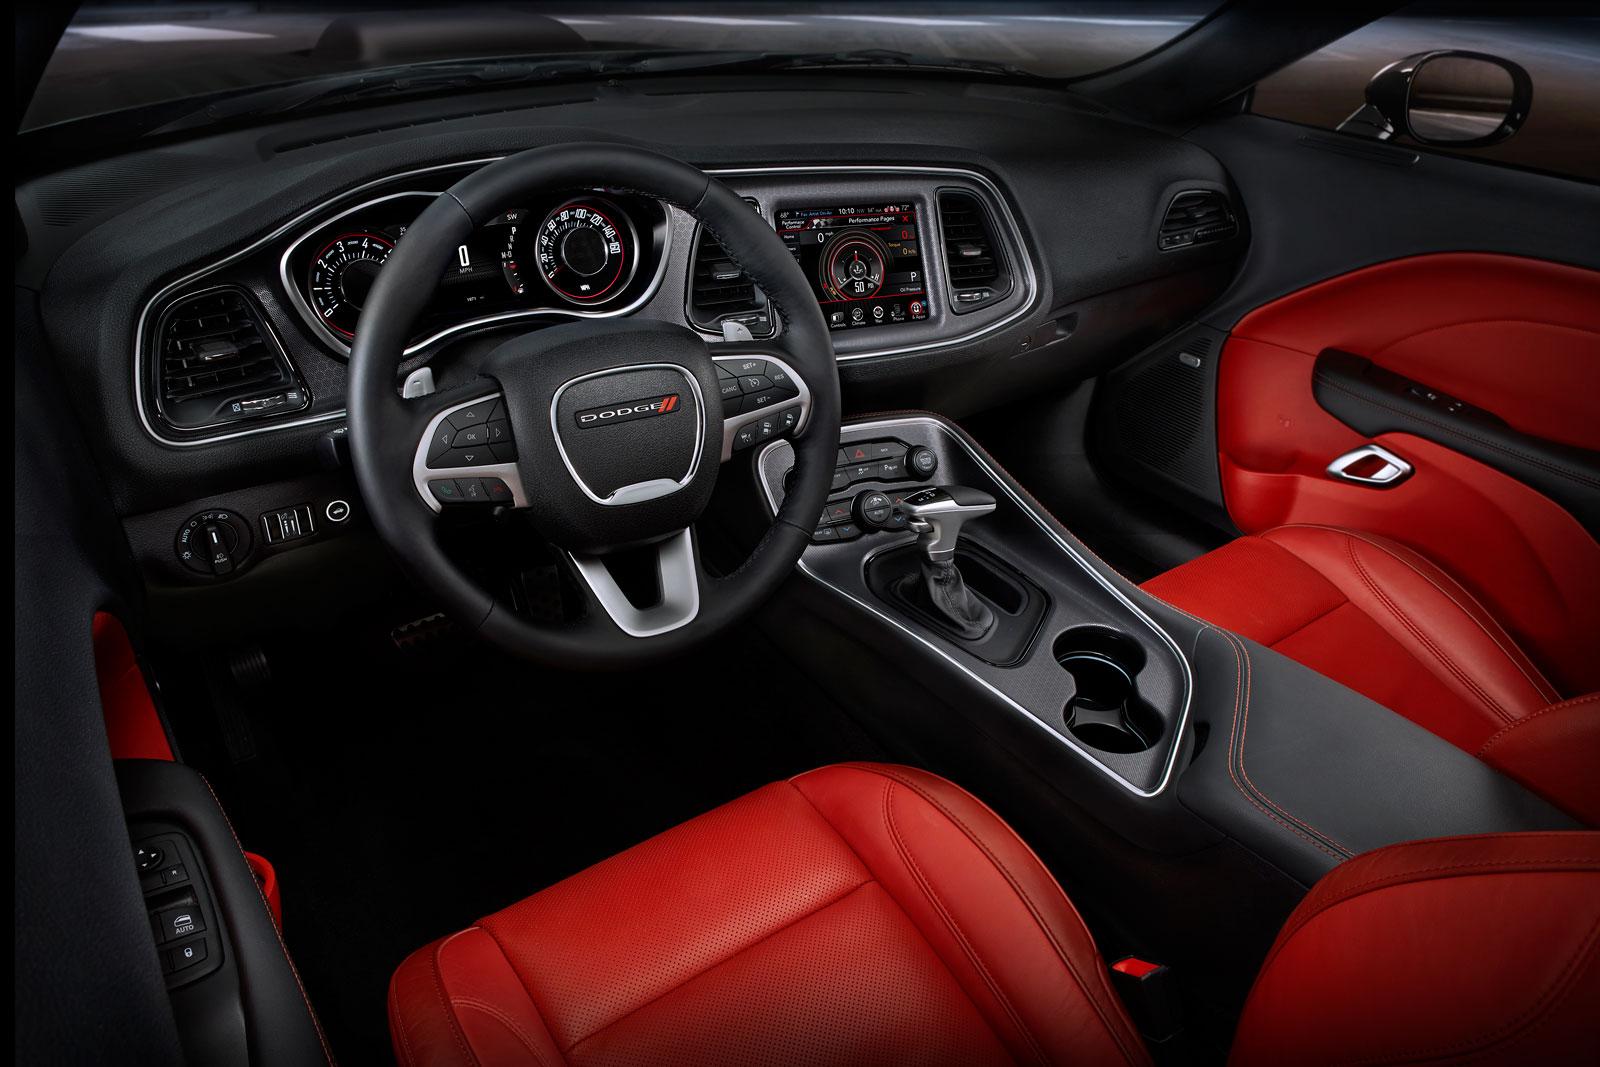 2015 Dodge Challenger Interior Car Body Design